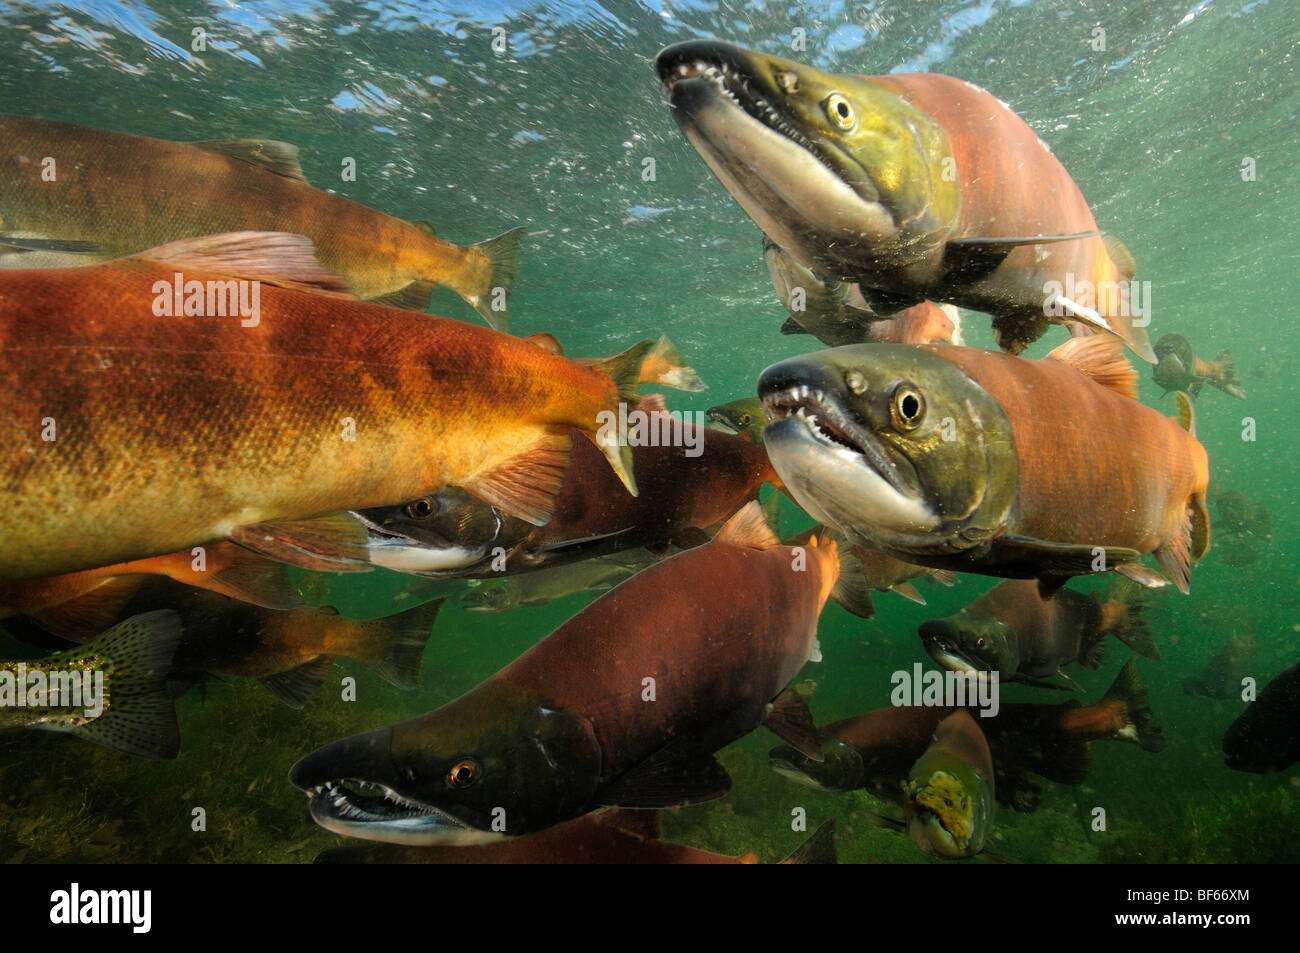 Rosso Salmone, Oncorhynchus nerka, Il Salmone Kokanee, East River, Colorado Immagini Stock